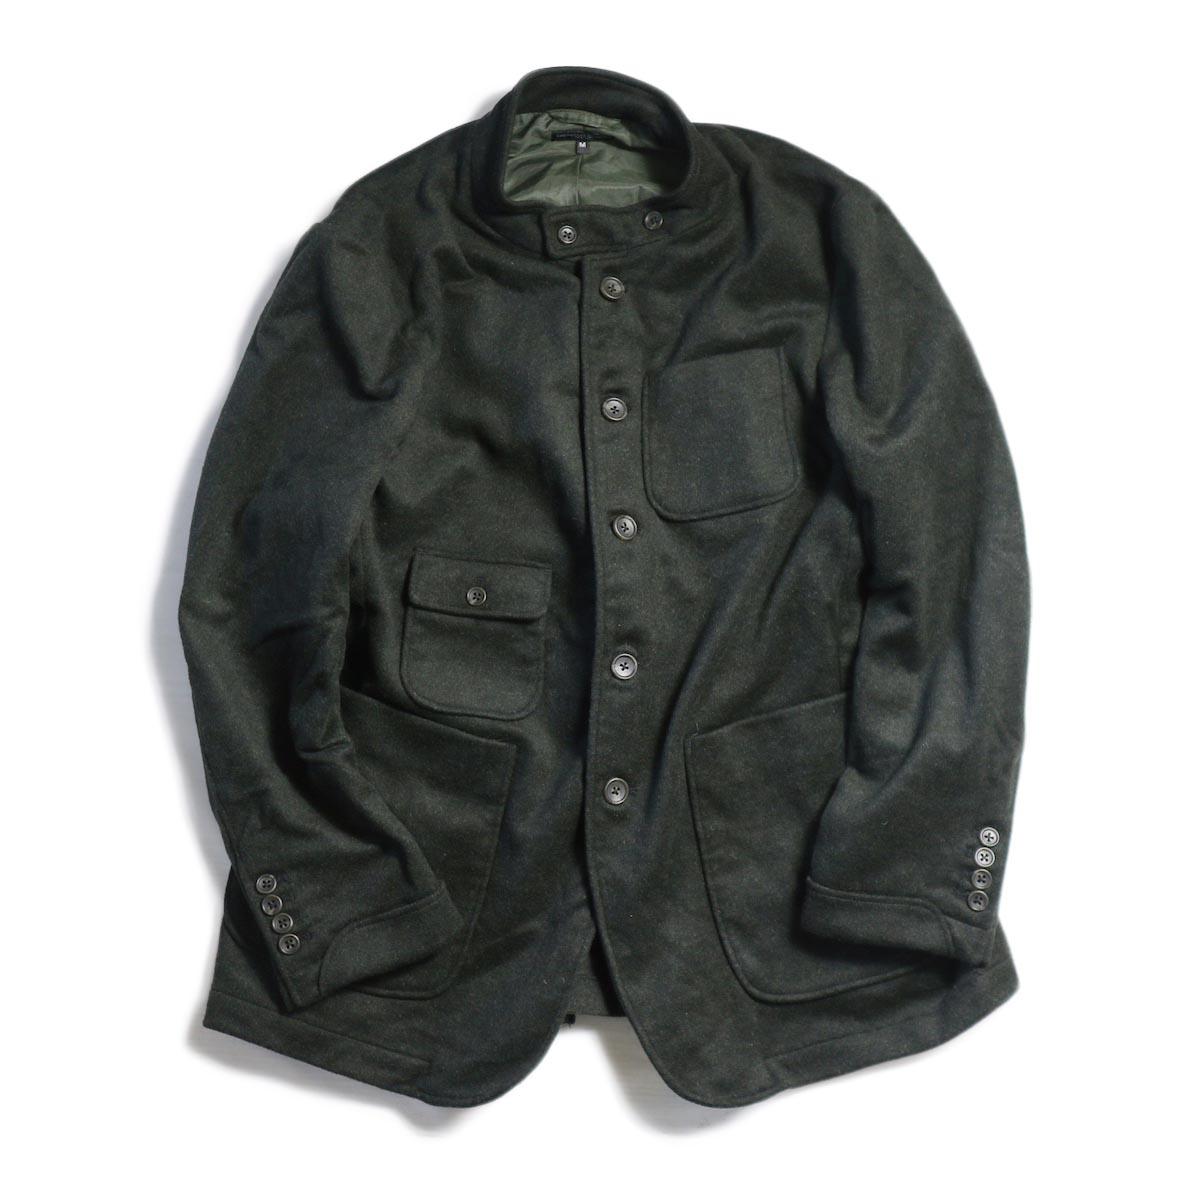 Engineered Garments / Grim Jacket -Wool Loden Cloth